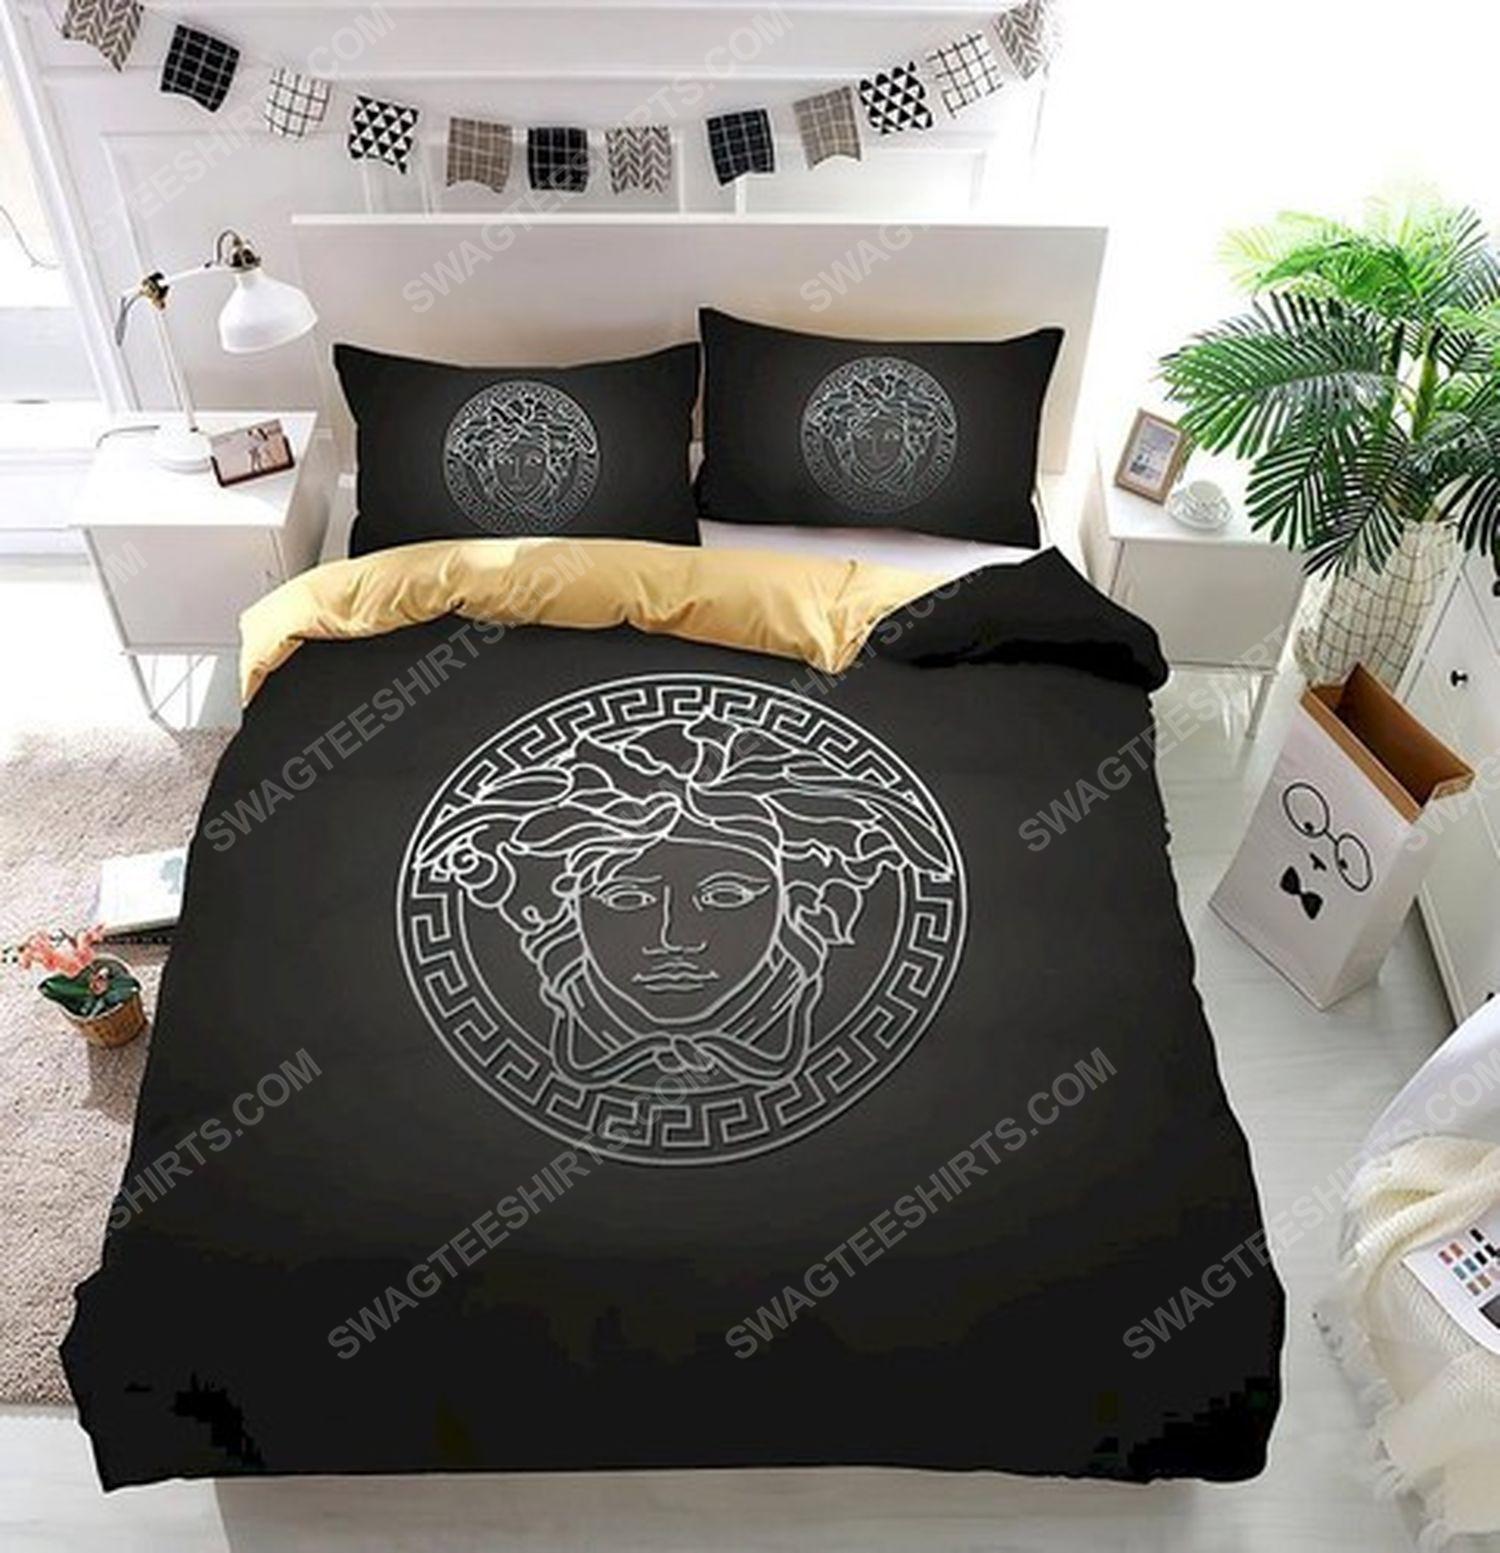 Versace home black version full print duvet cover bedding set 3 - Copy